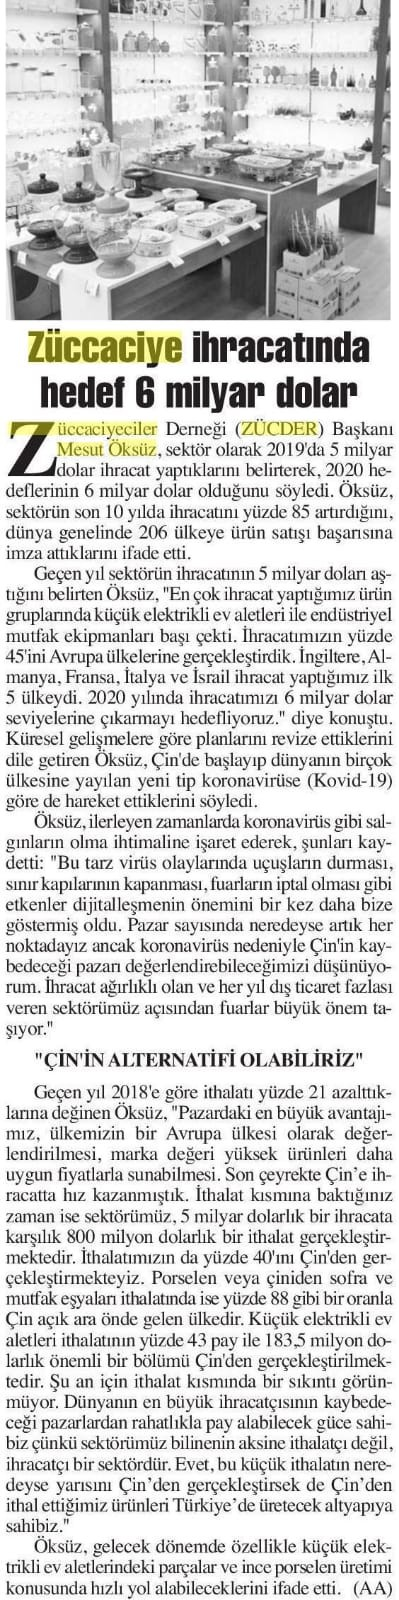 ZÜCDER BAŞKENT ANKARA 16.03.2020